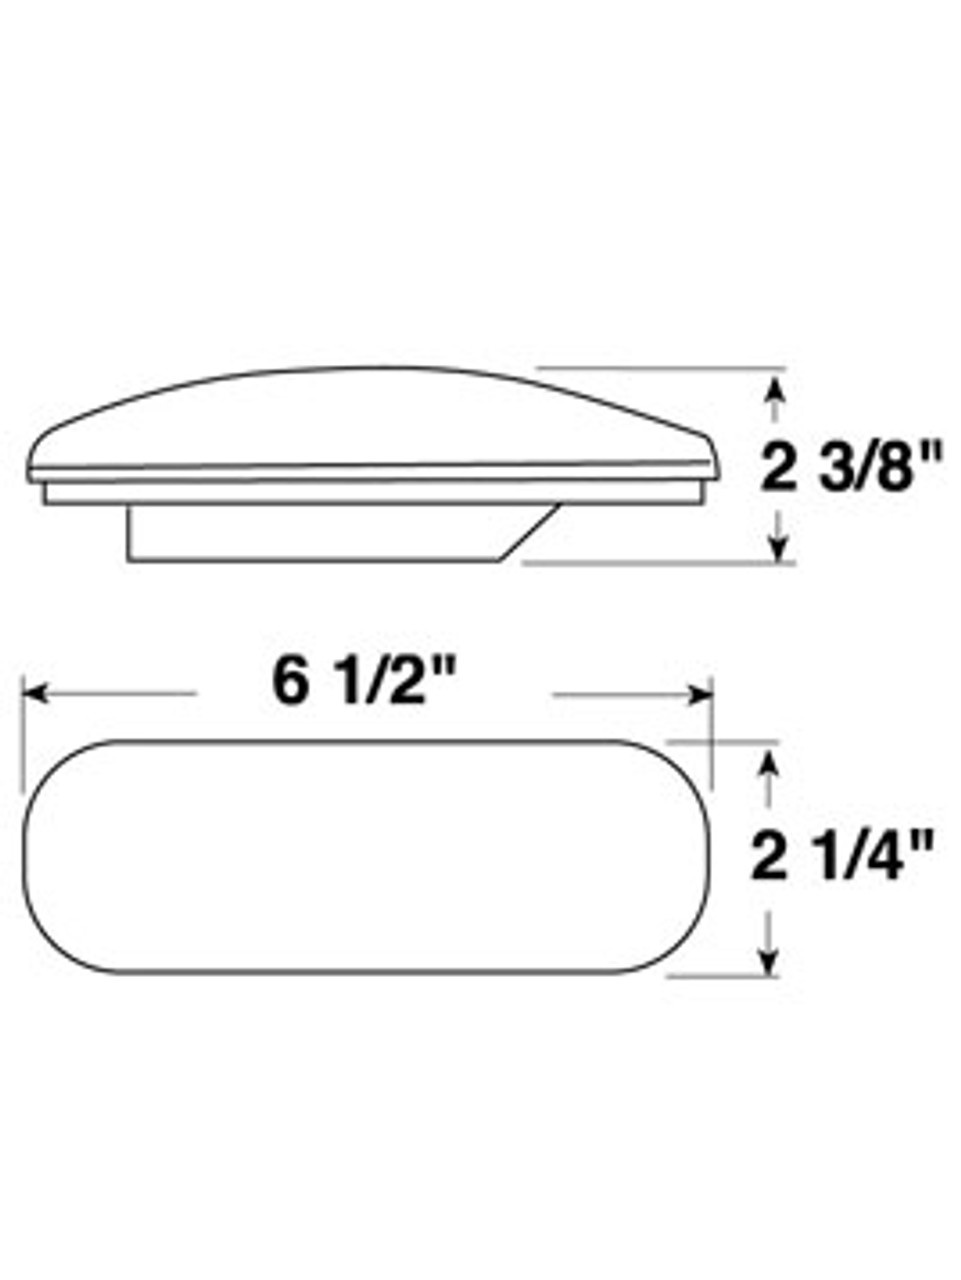 421R --- Oval Sealed Tail Light